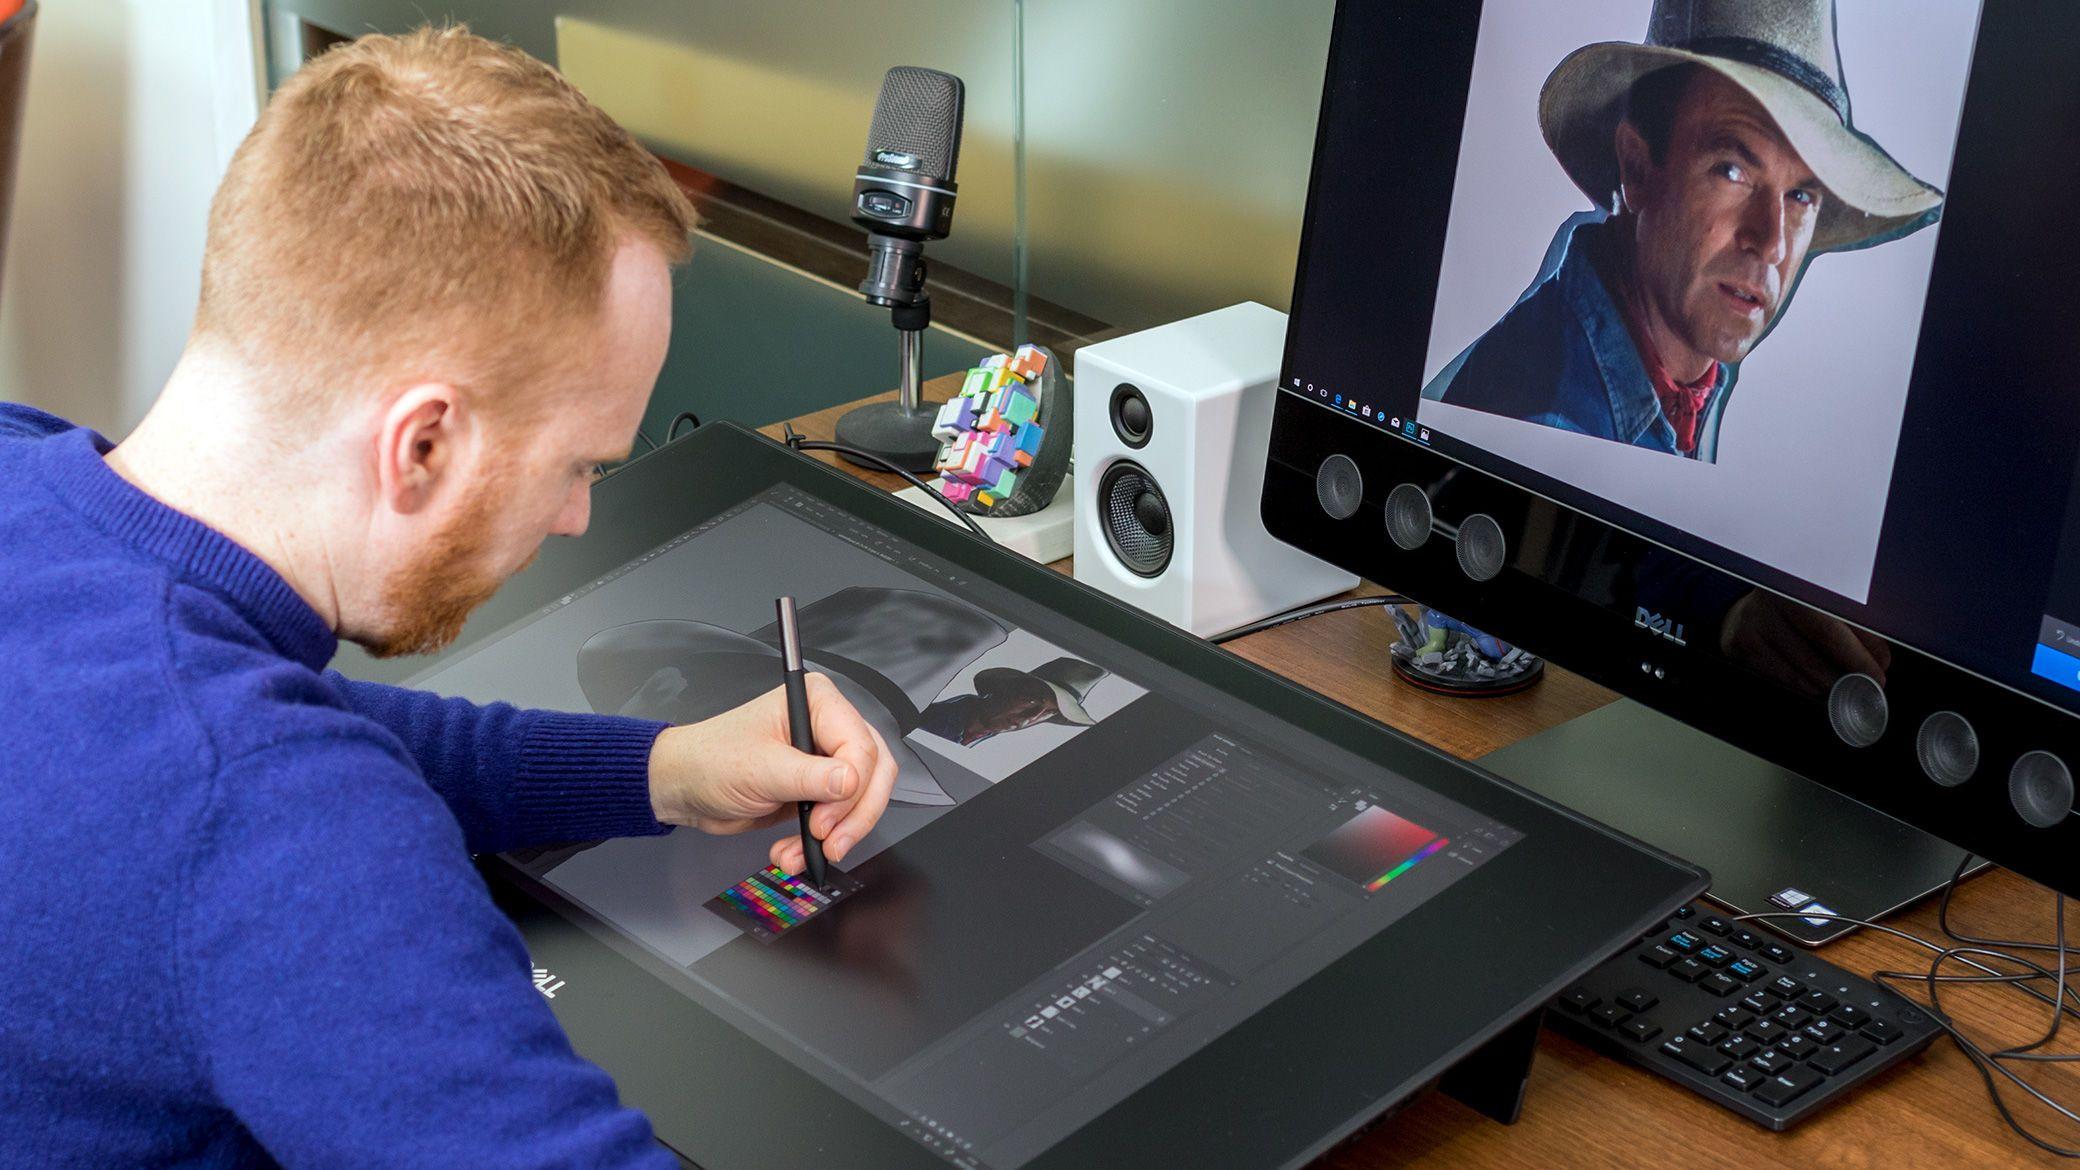 Affordable Cintiq alternative drawing tablets